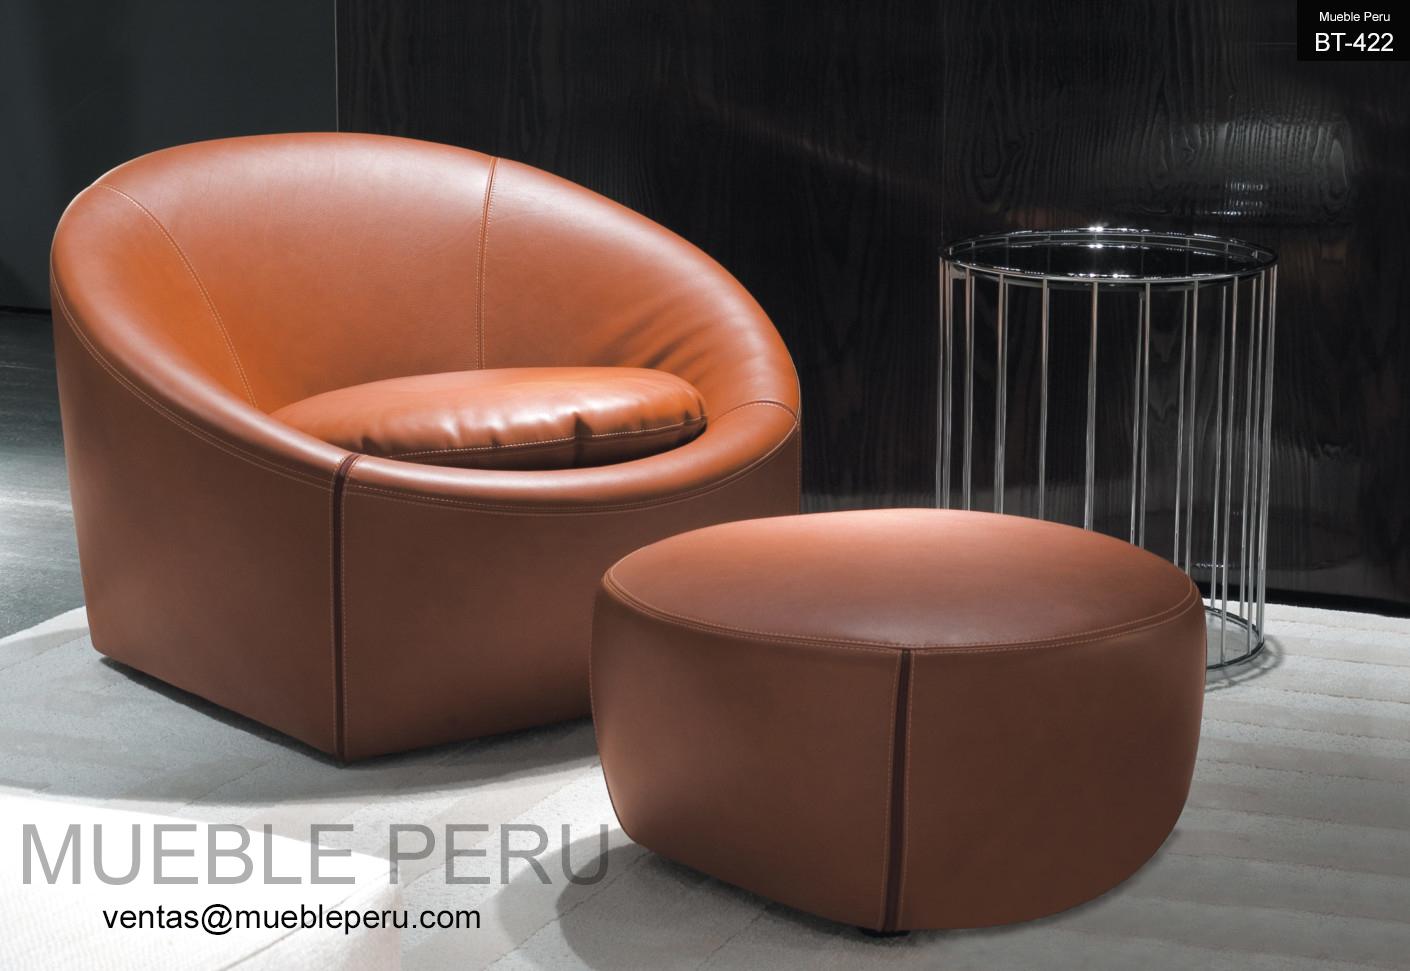 Muebles de sala butacas de dise o y muebles modernos for Disenos de muebles de sala modernos